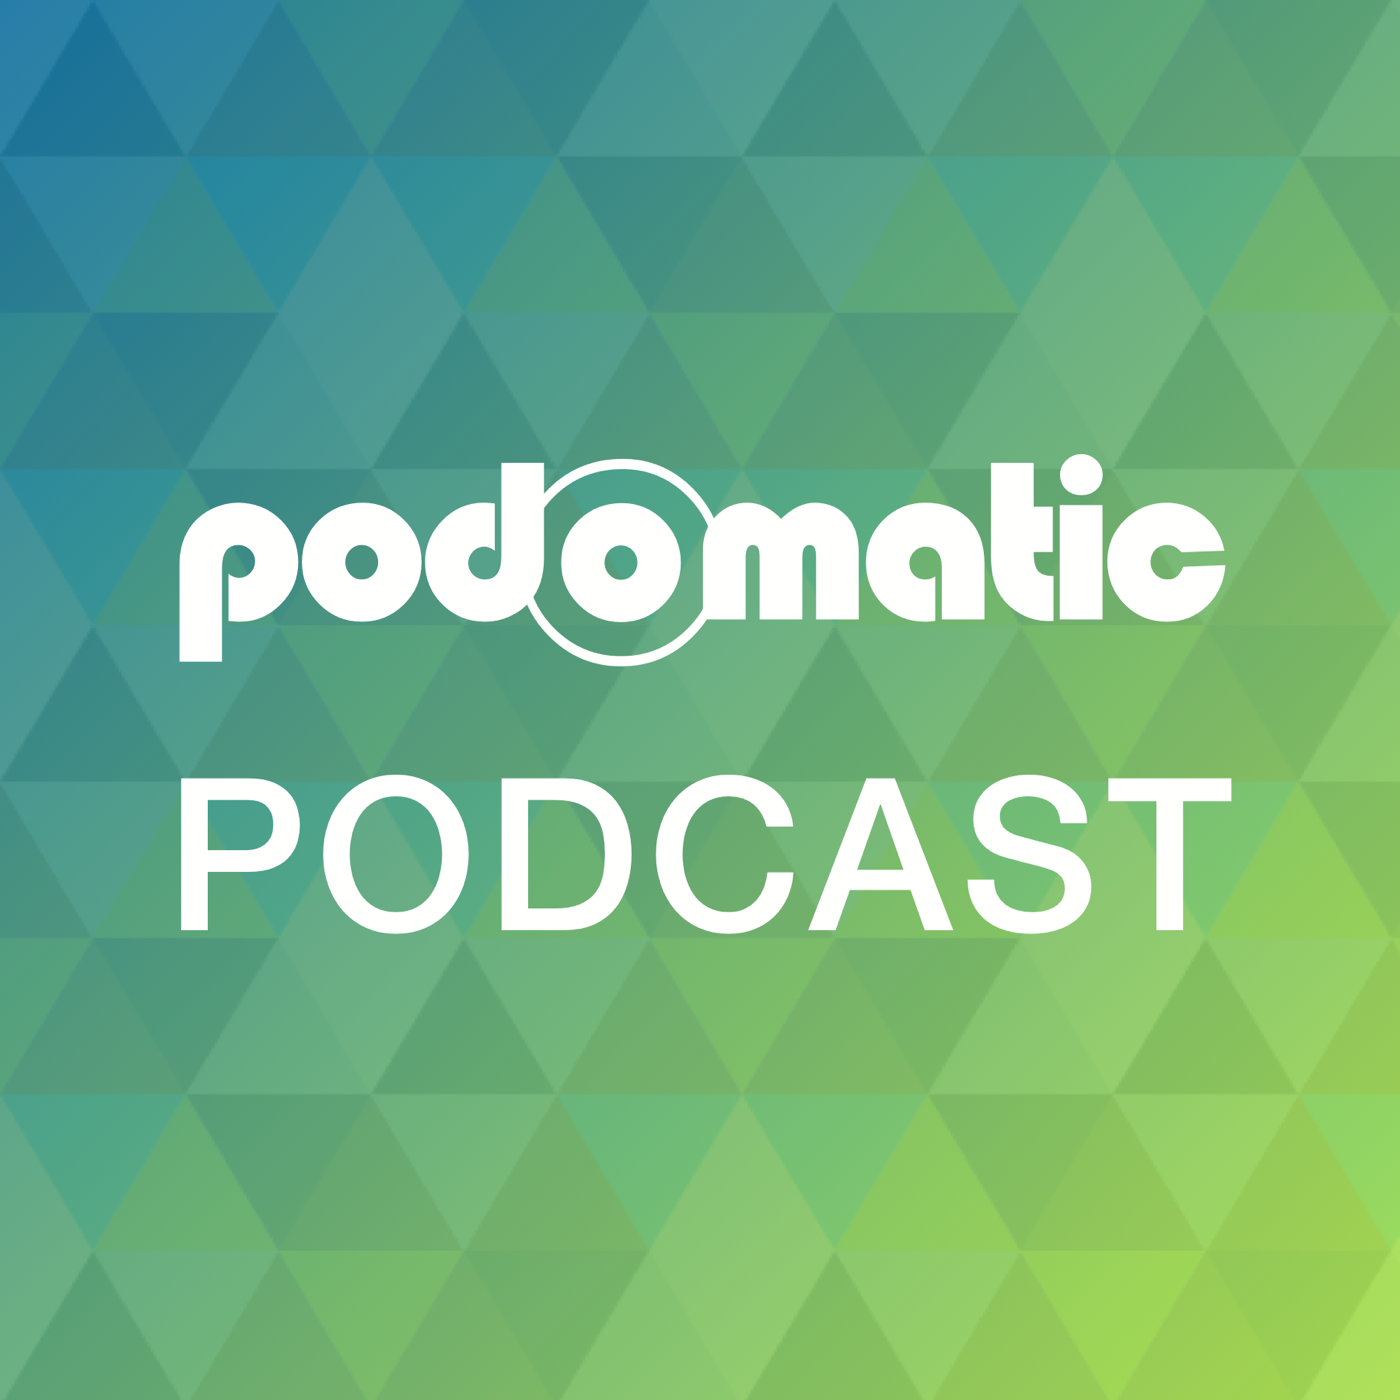 Jonathan Sanden's Podcast